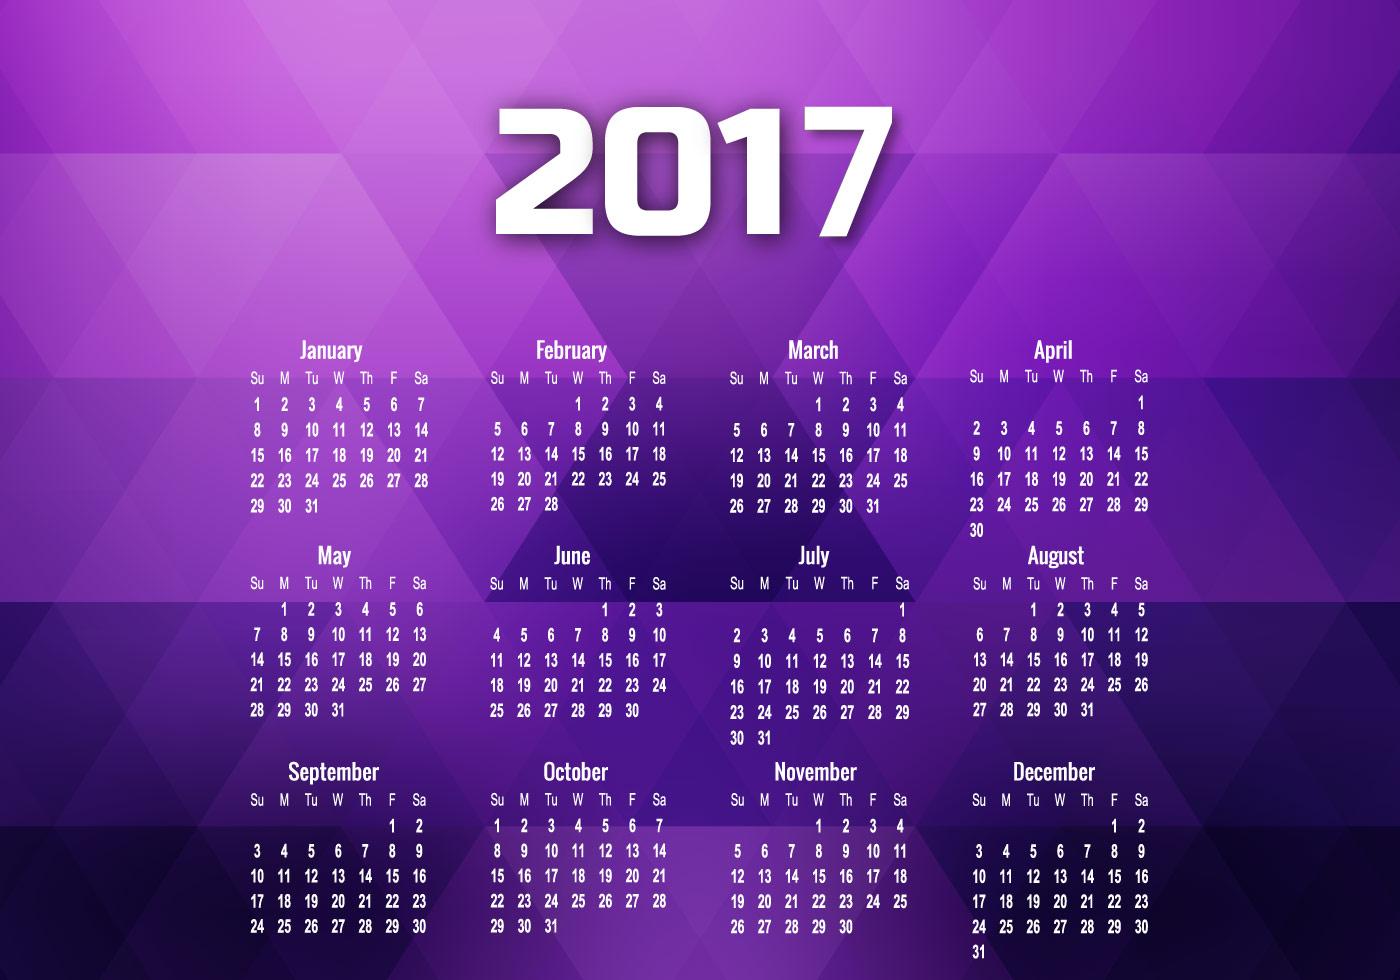 Calendar Design Free Vector : Calendar design download free vector art stock